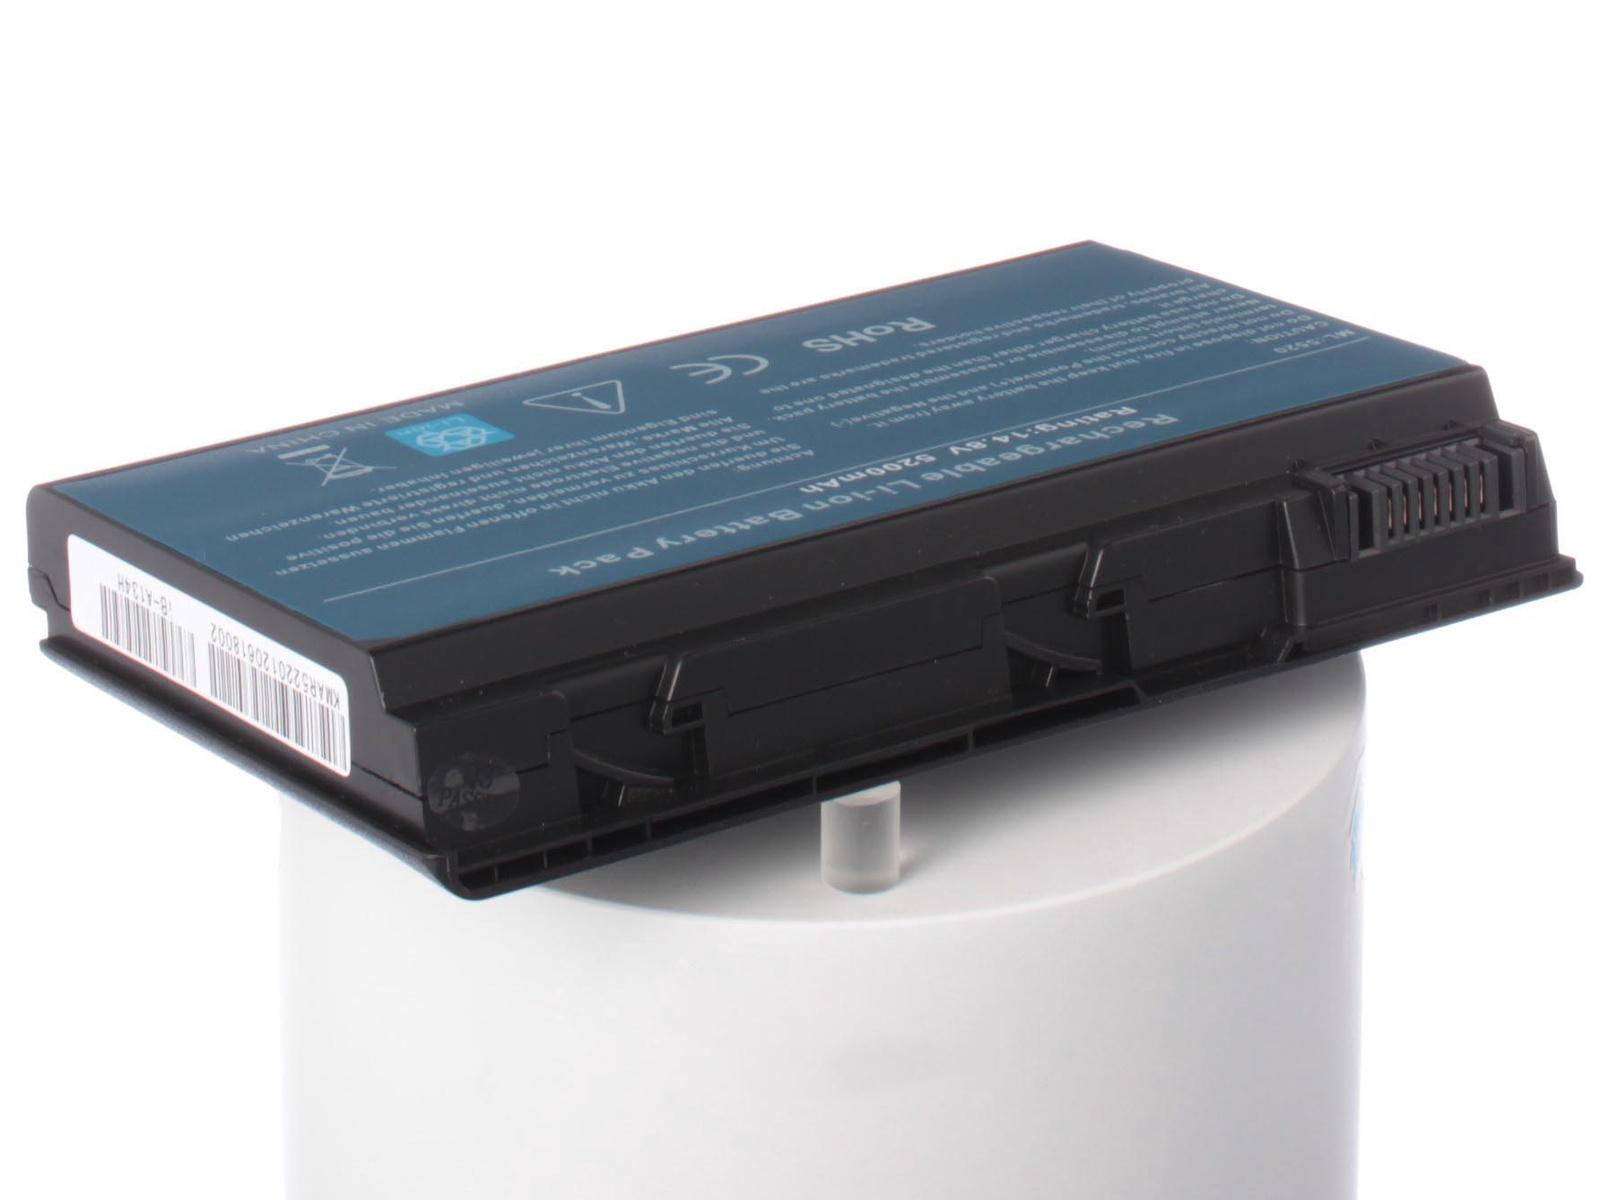 Аккумулятор для ноутбука iBatt Acer GRAPE32, TM00741, TM00751, CONIS71, TM00742, GRAPE34, 3UR18650Y-2-INV-10 аккумулятор для ноутбука hp compaq hstnn lb12 hstnn ib12 hstnn c02c hstnn ub12 hstnn ib27 nc4200 nc4400 tc4200 6cell tc4400 hstnn ib12